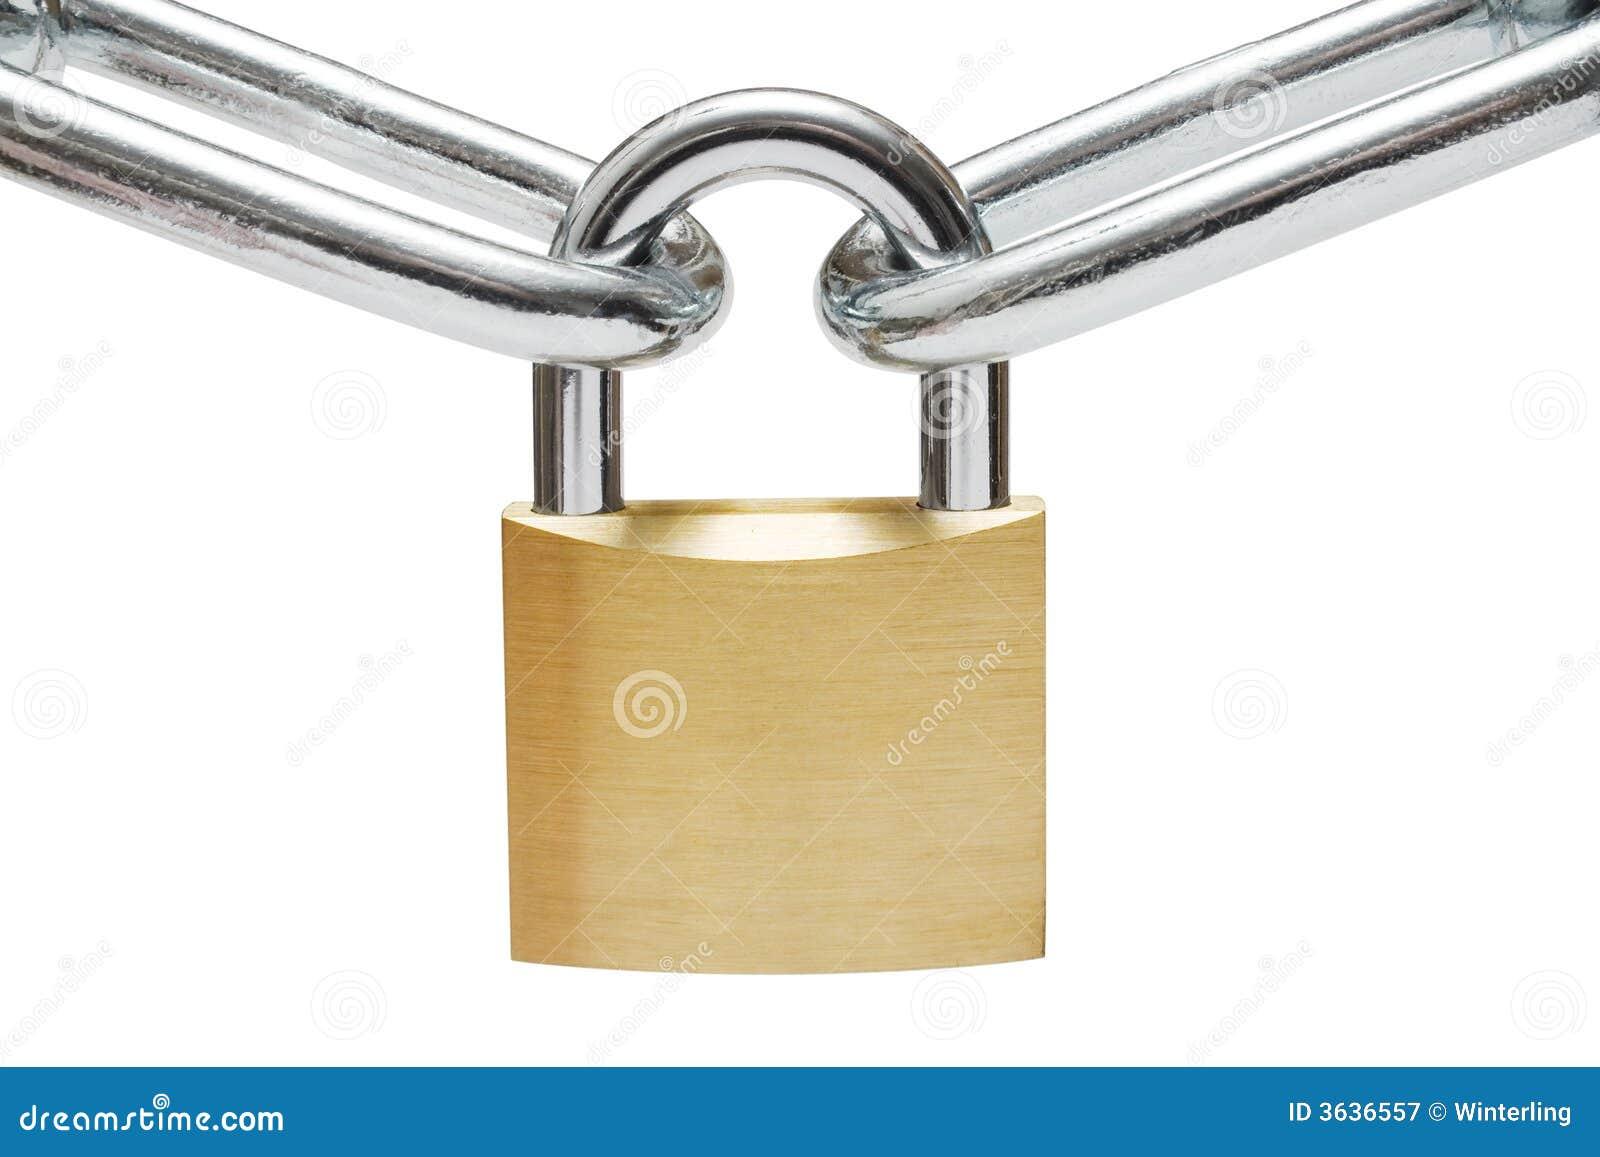 Padlock on Chain Links